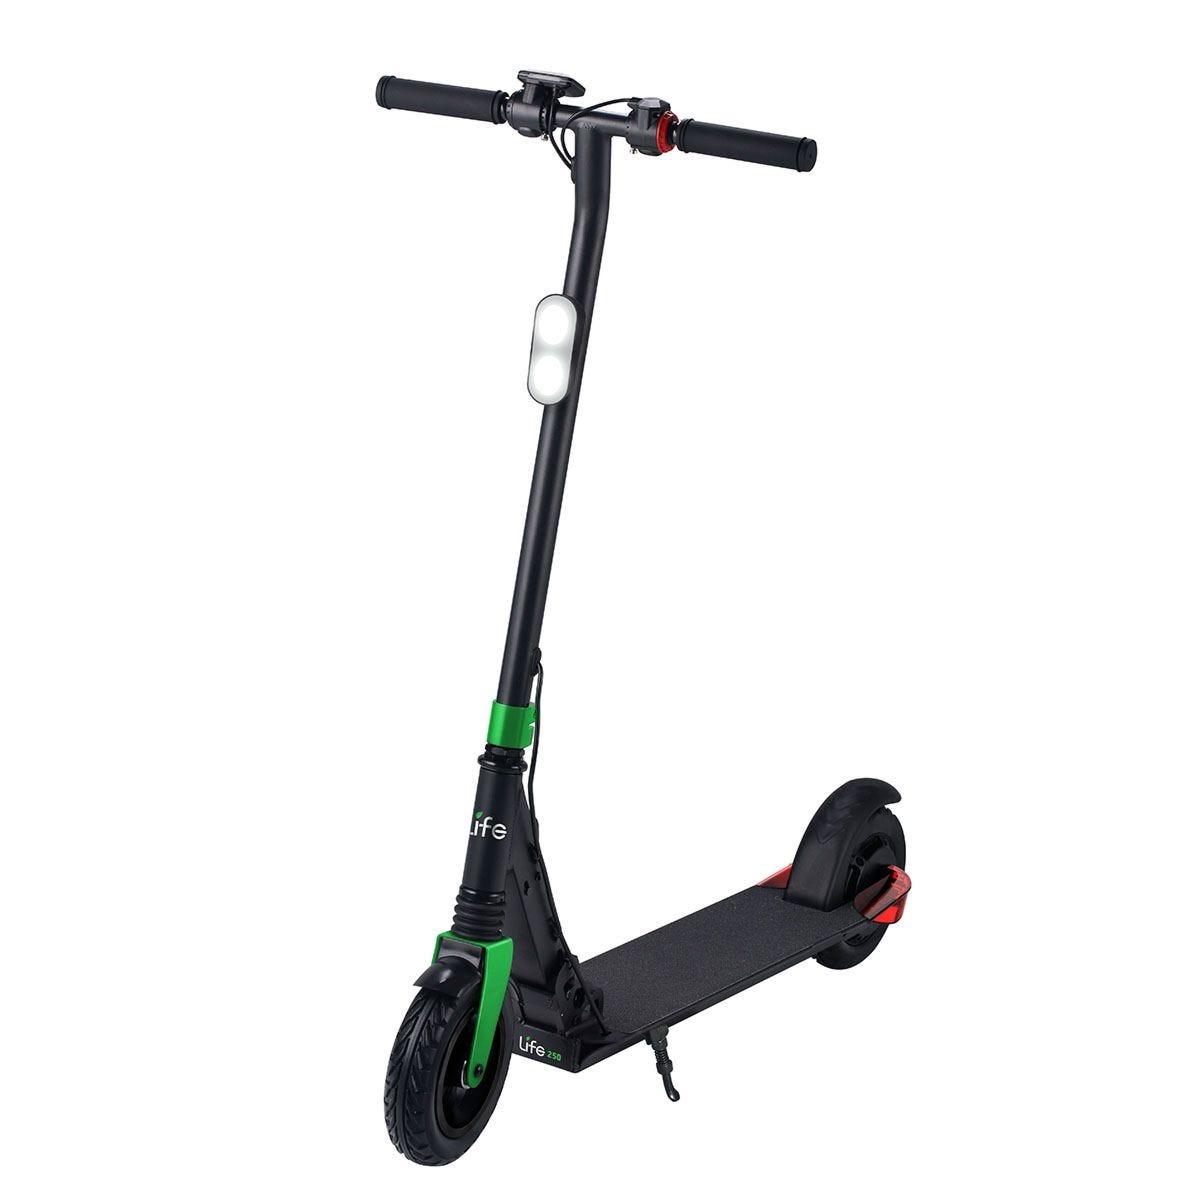 Li-Fe 250 Lithium Scooter - Black & Green